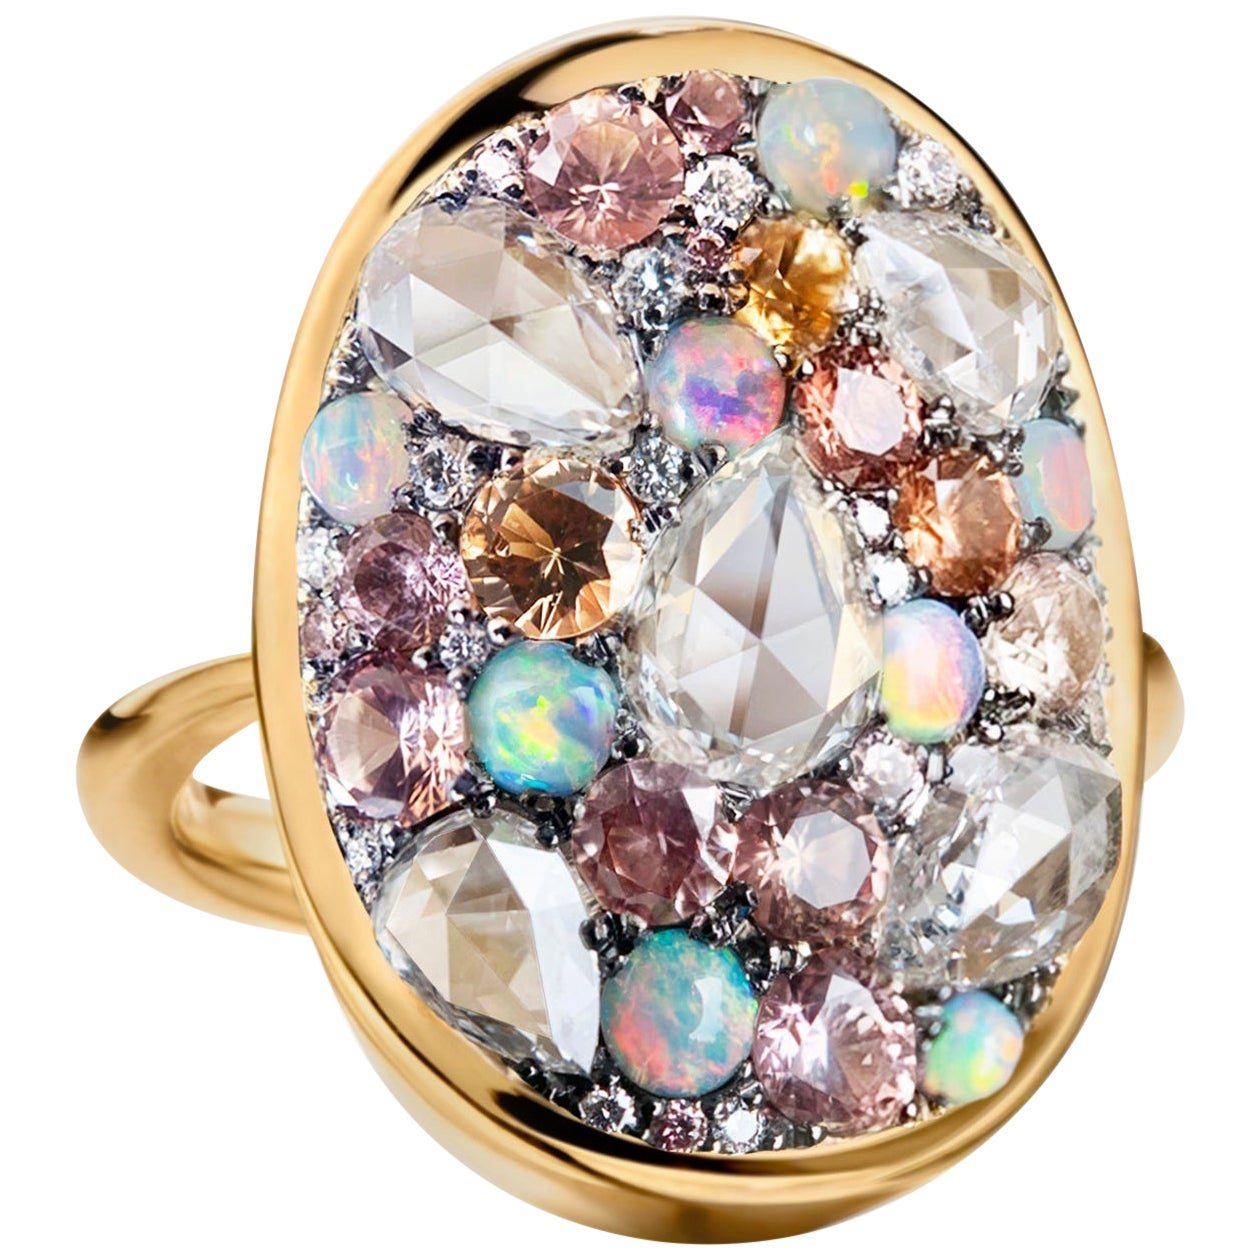 Padparadscha Sapphire, Australian Opal, Rose-Cut Diamond Pave Ring